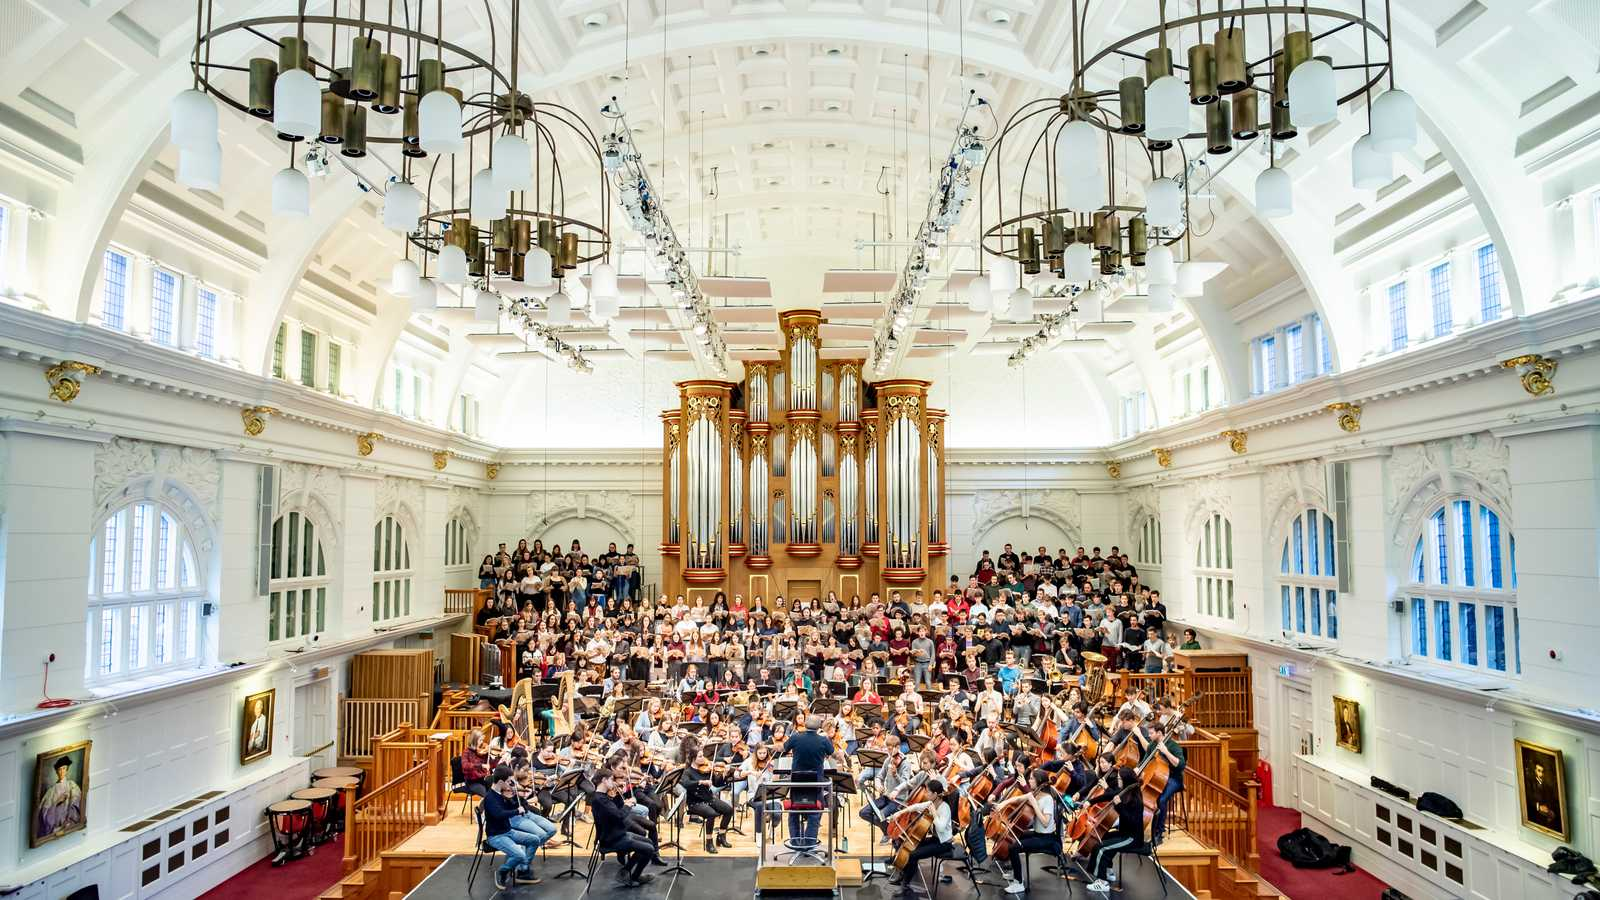 The Amaryllis Fleming Concert Hall